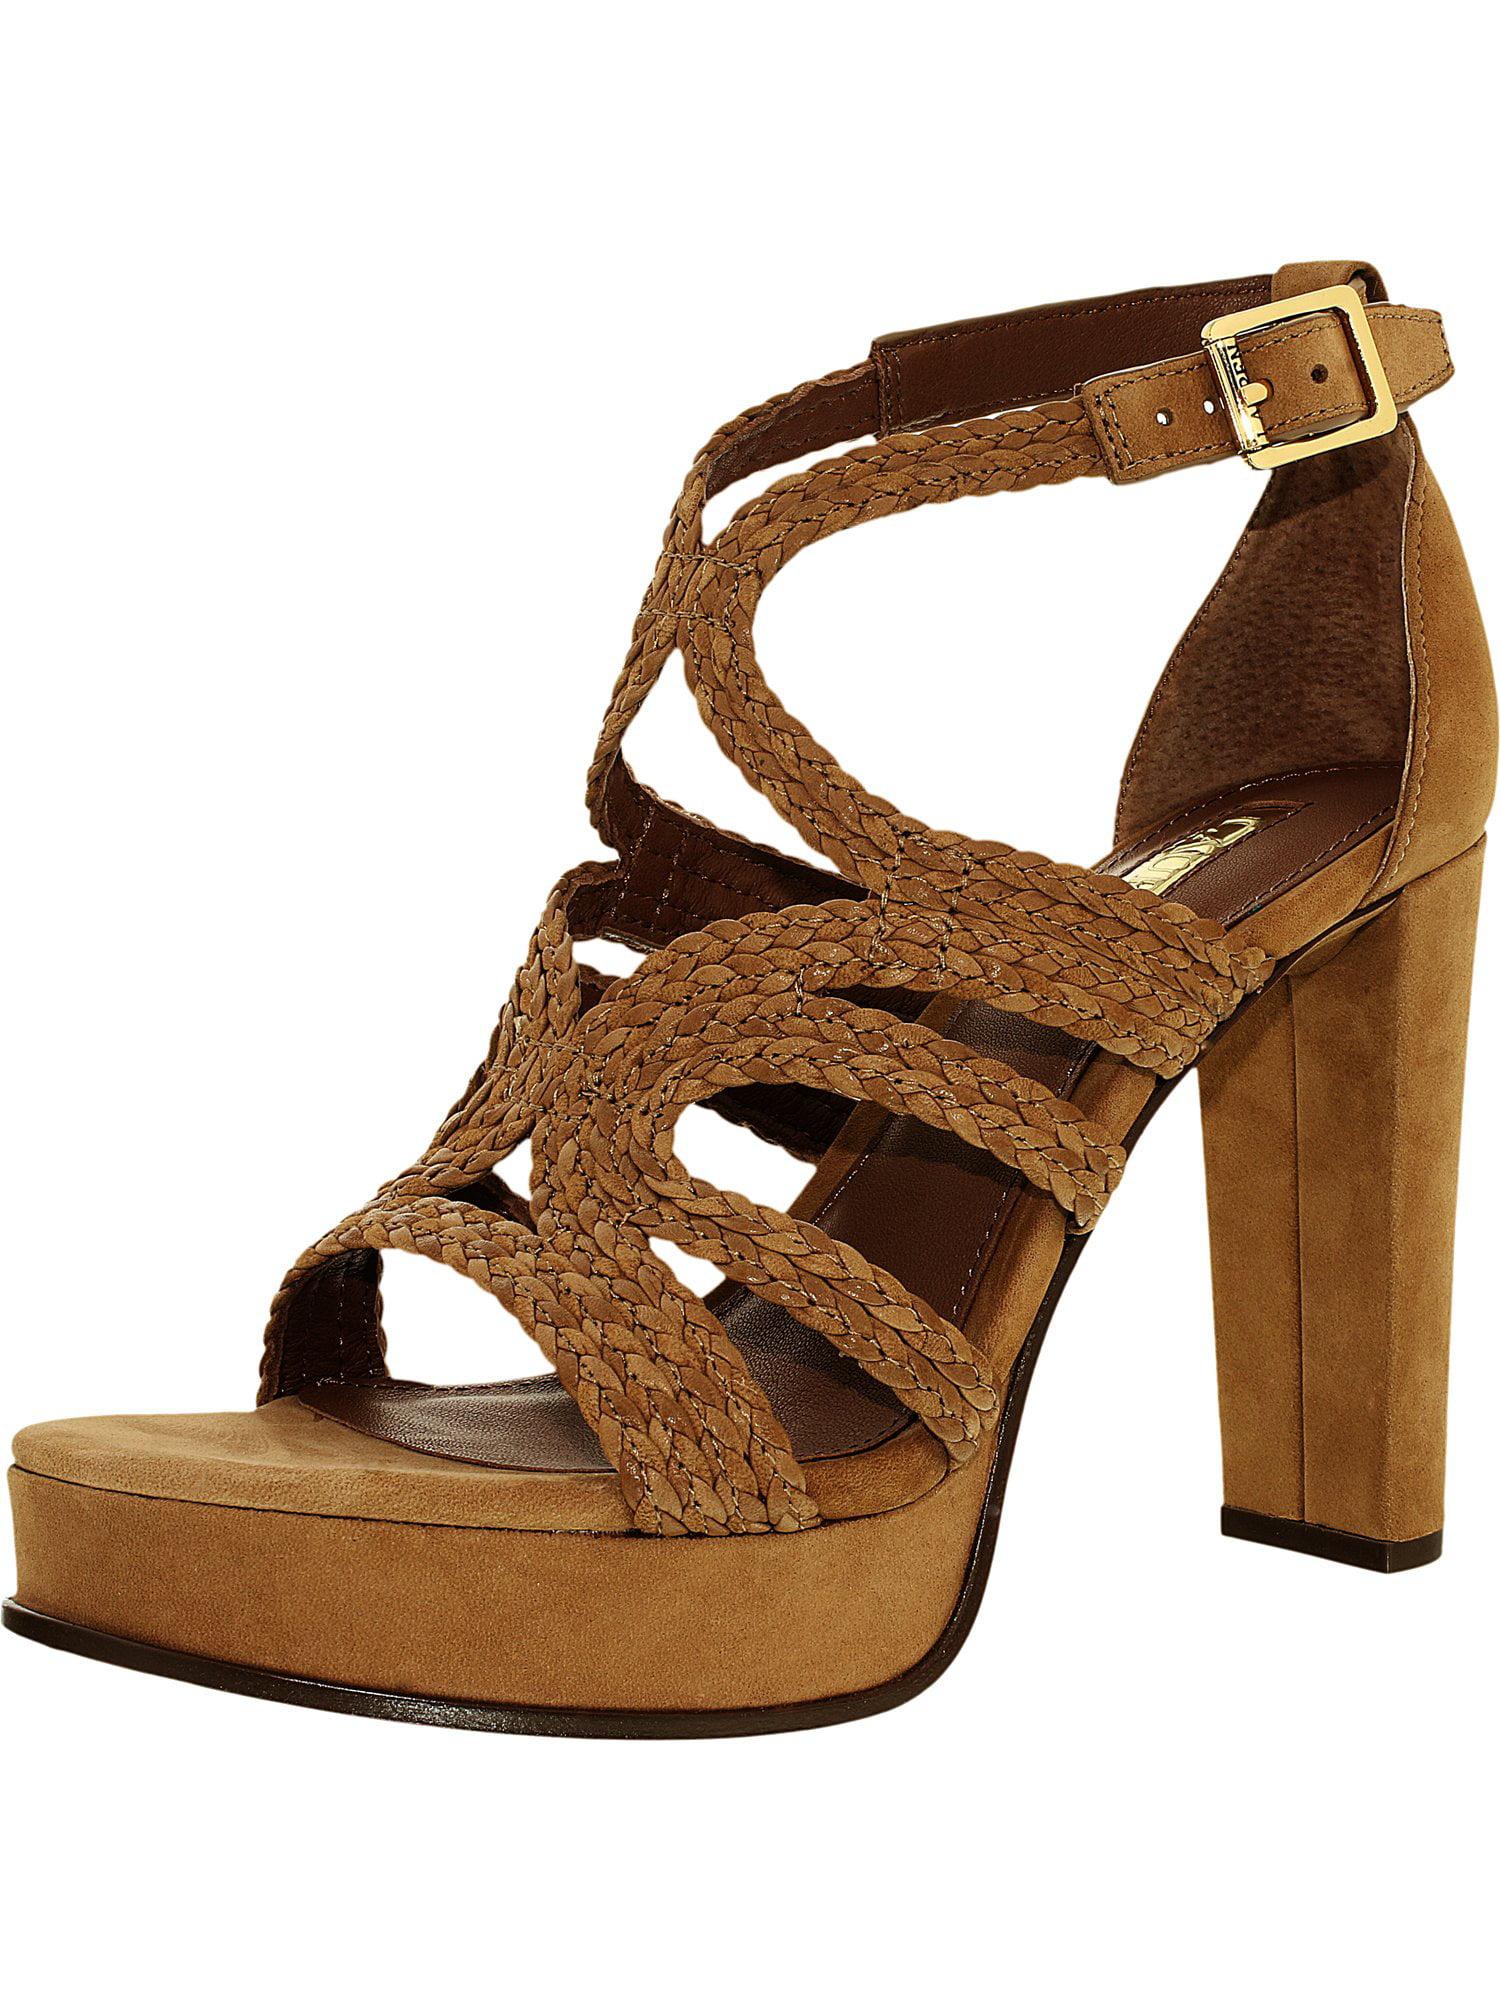 Lauren Ralph Women's Aleena-Sn-Drs Leather Polo Tan Ankle-High Pump - 9M